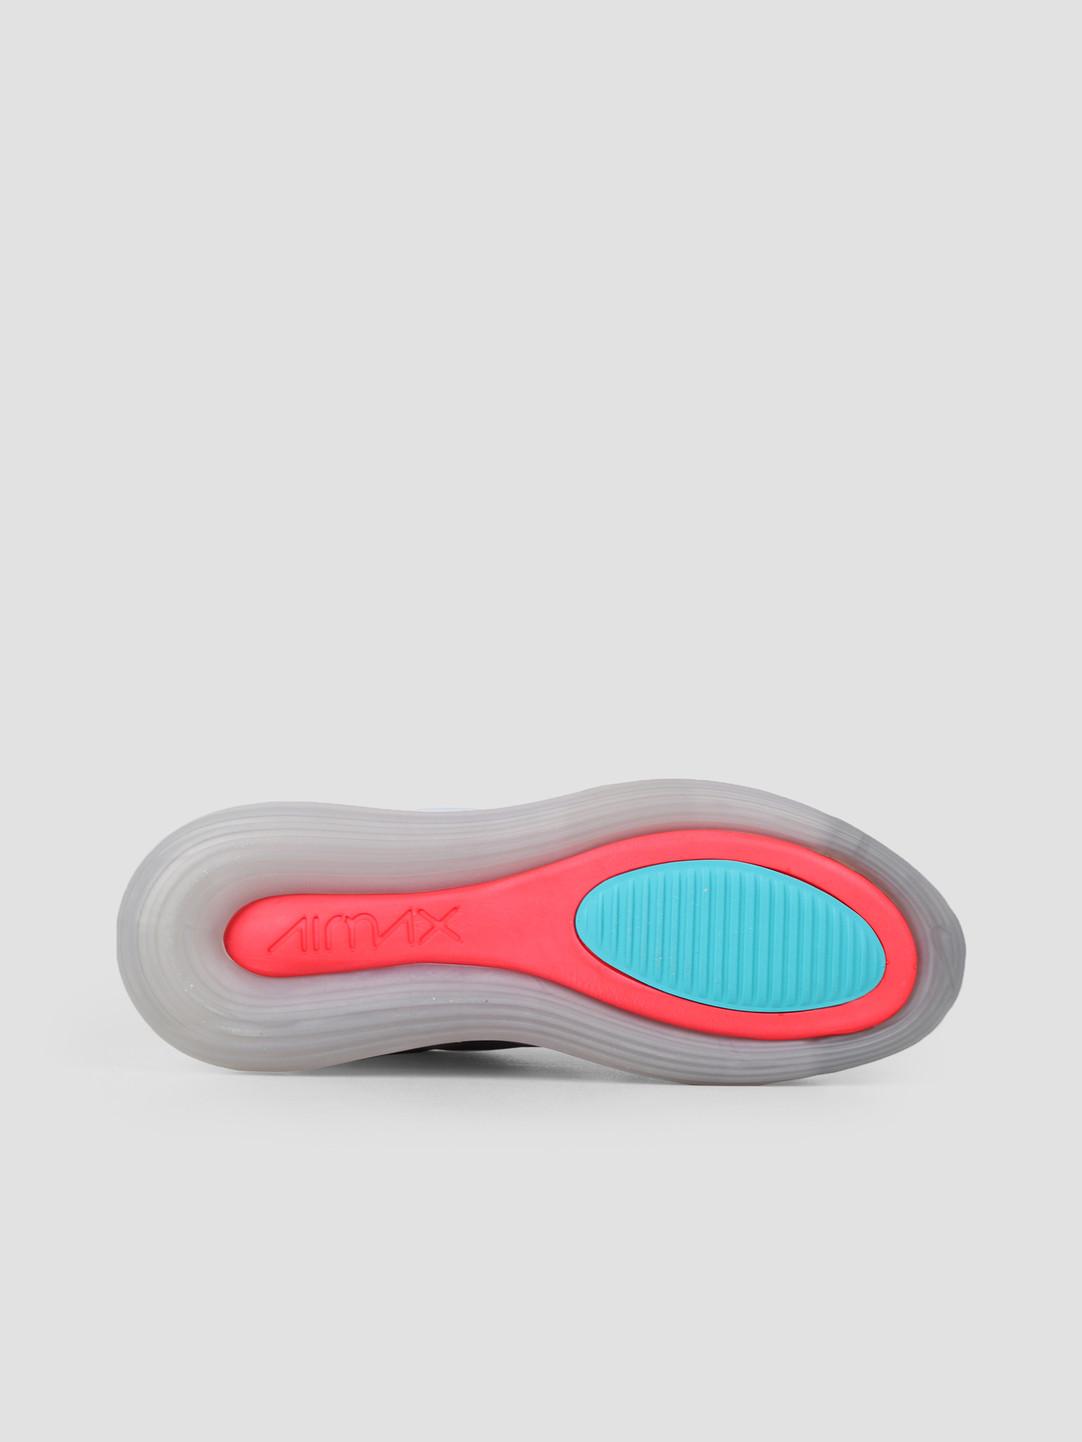 Nike Nike Air Max 720 Wolf Grey Teal Nebula Red Orbit White AO2924-011